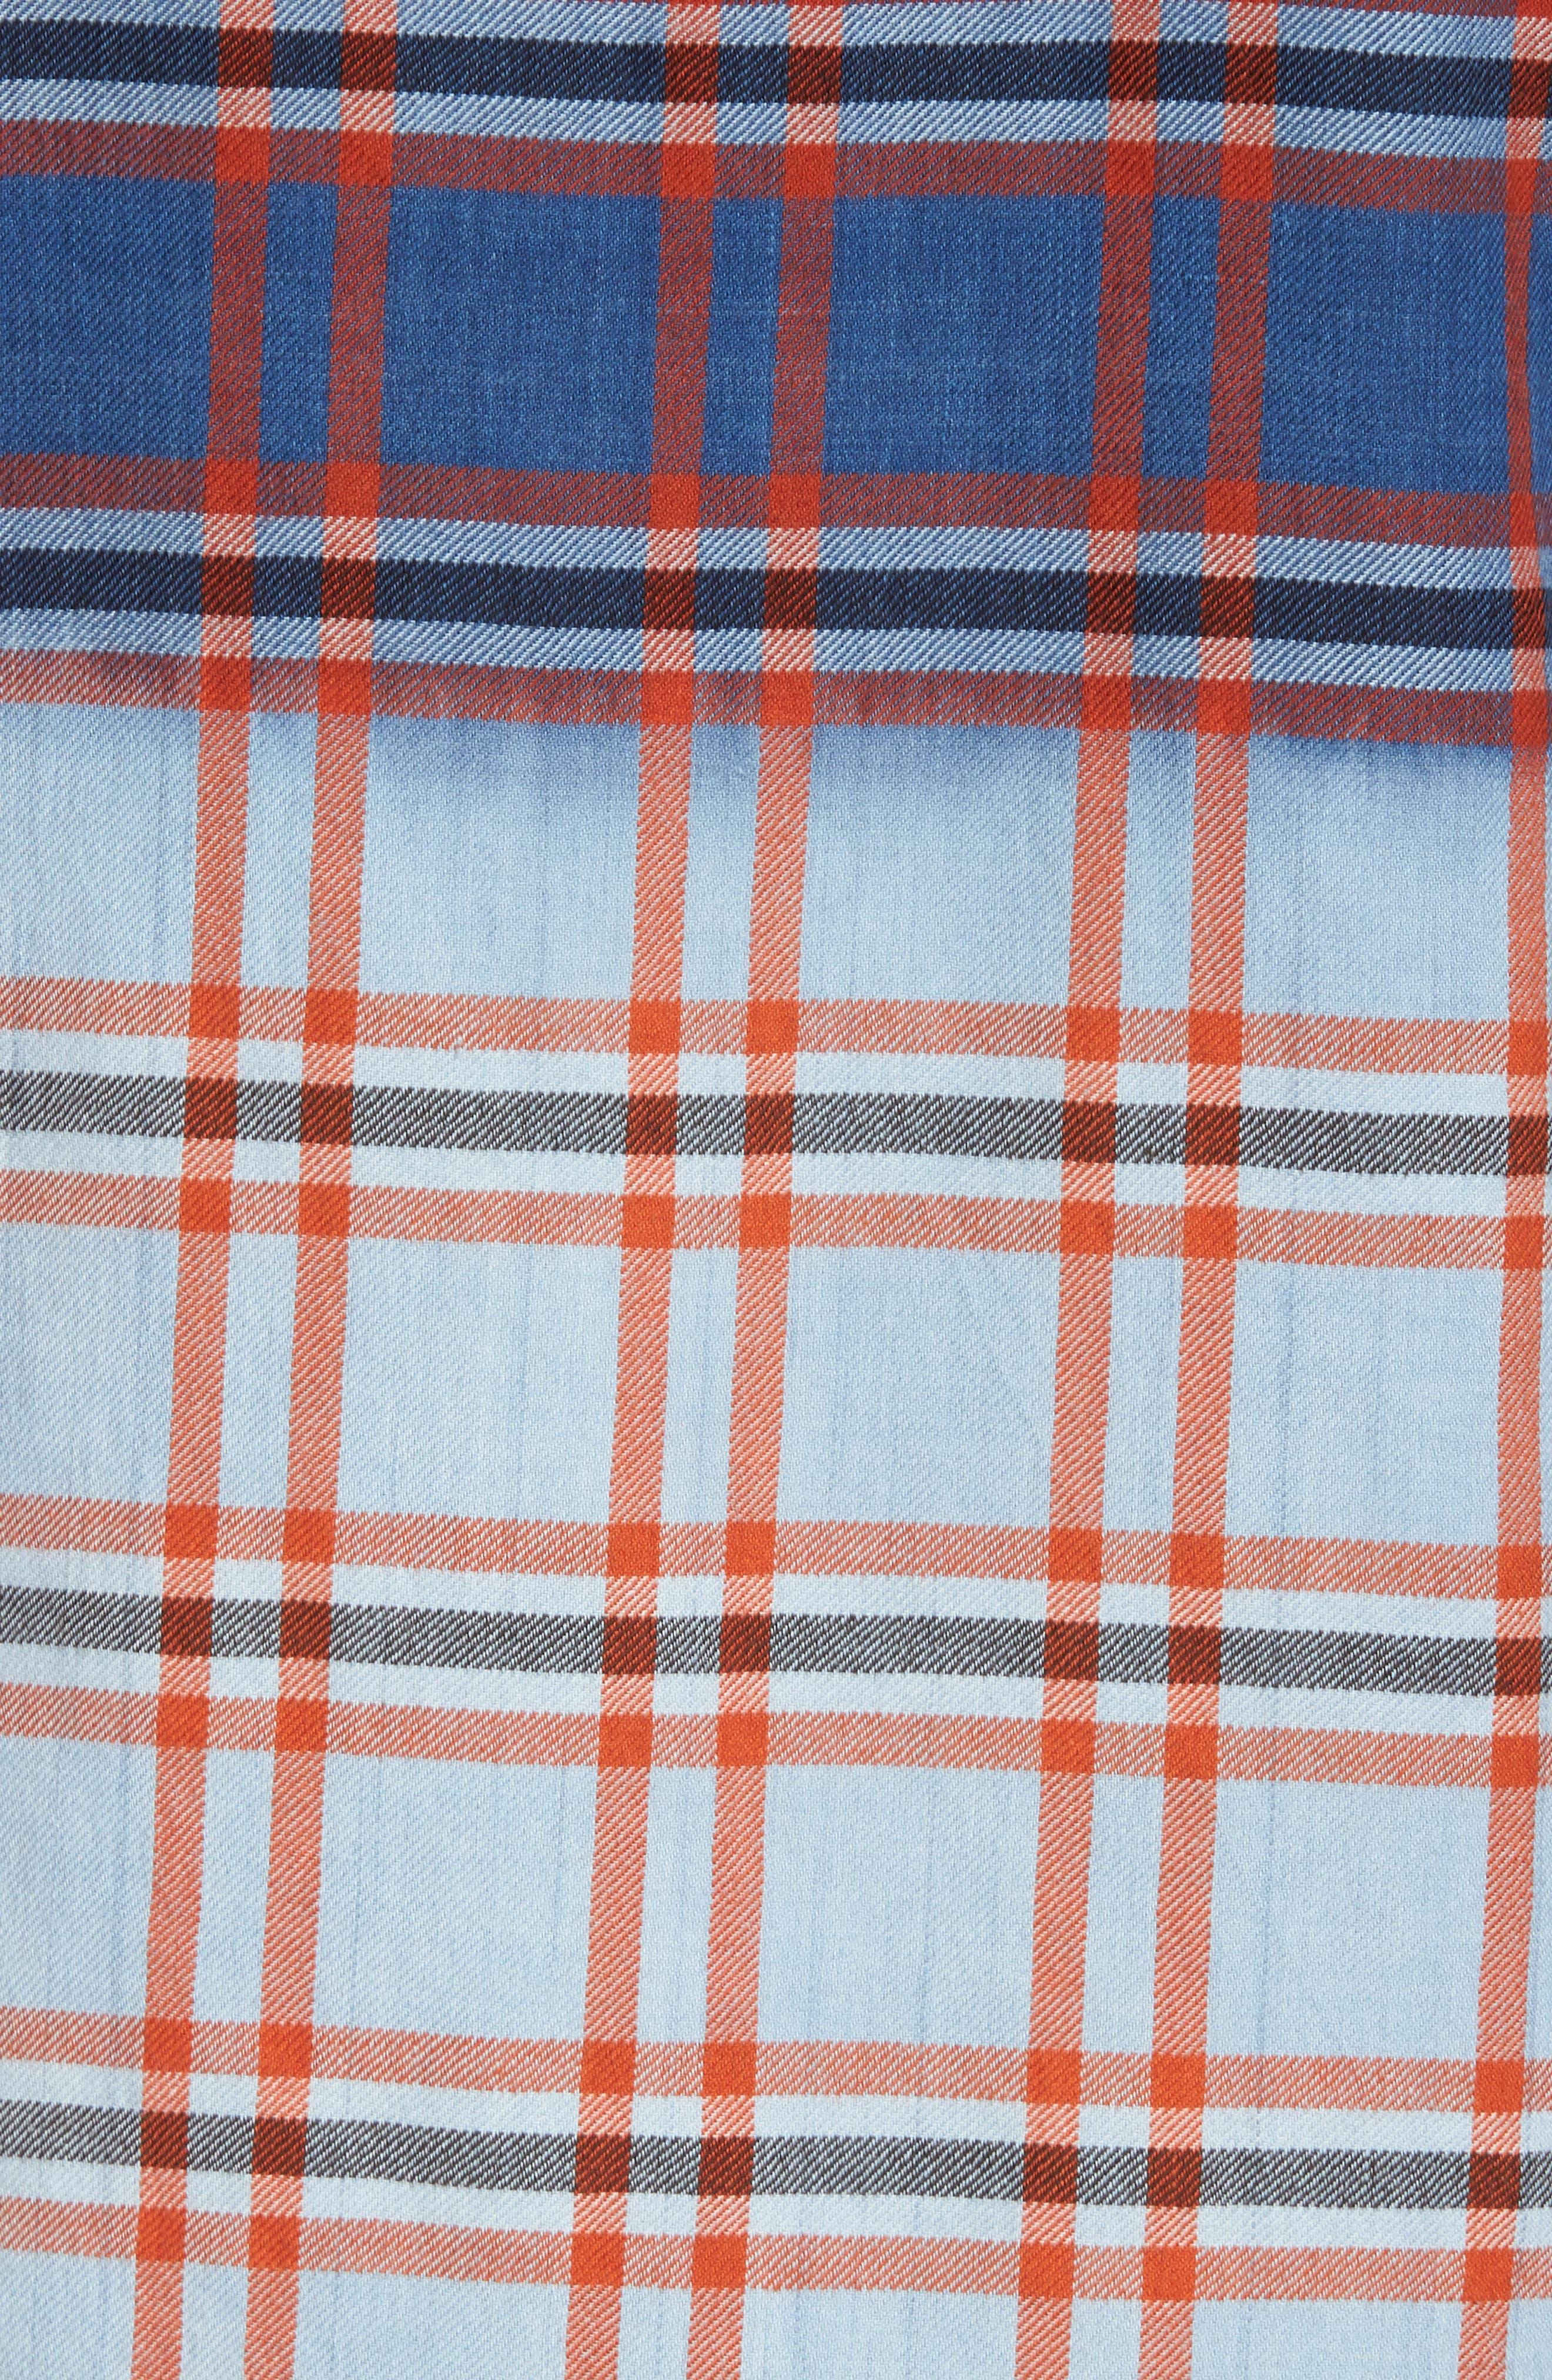 Prismatic Check Woven Shirt,                             Alternate thumbnail 5, color,                             458